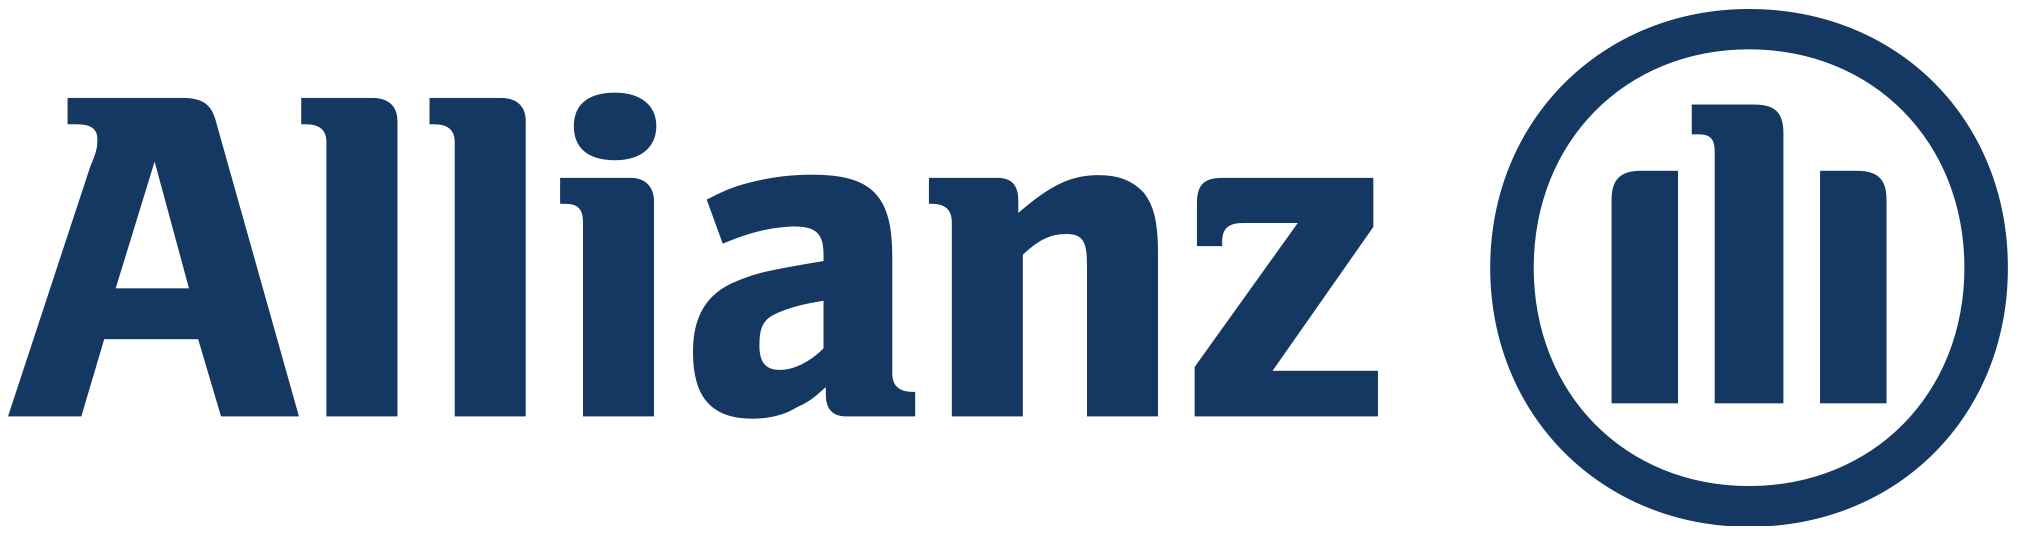 Allianz Biztosítói Zrt. c58eb2acb7